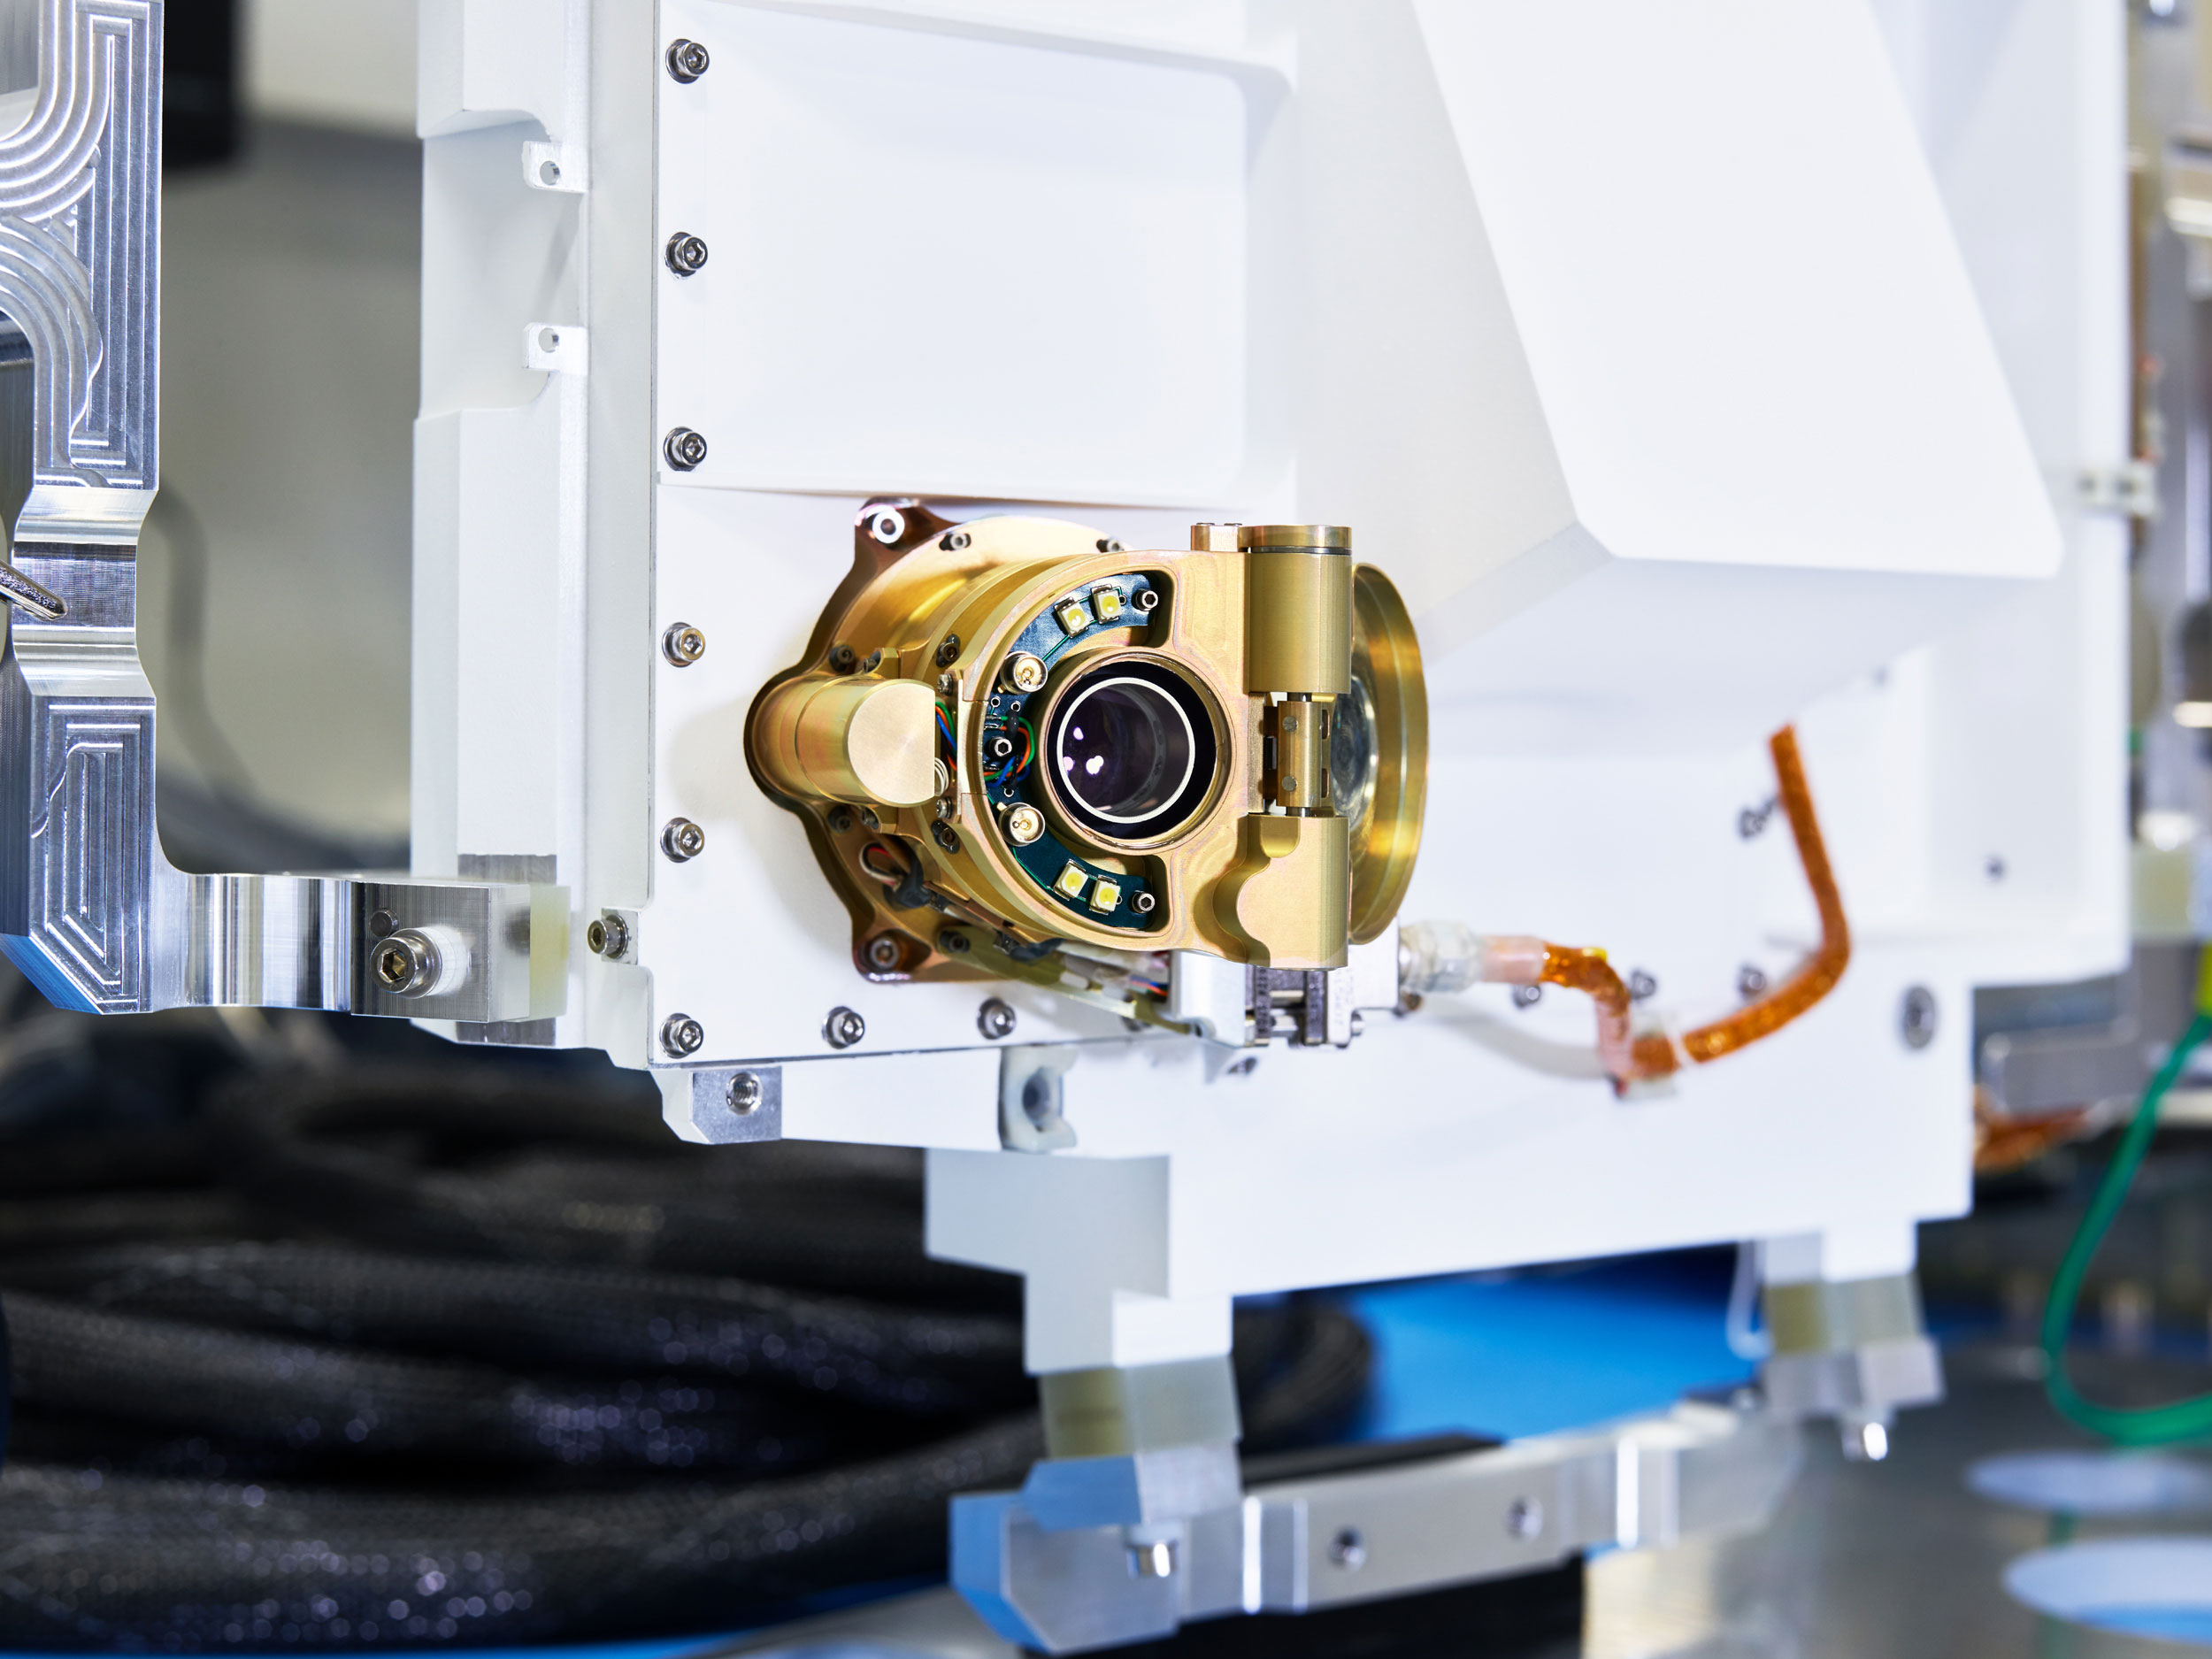 Mars 2020 SHERLOC Instrument Engineering Model, NASA/JPL, Pasadena, California, 2018